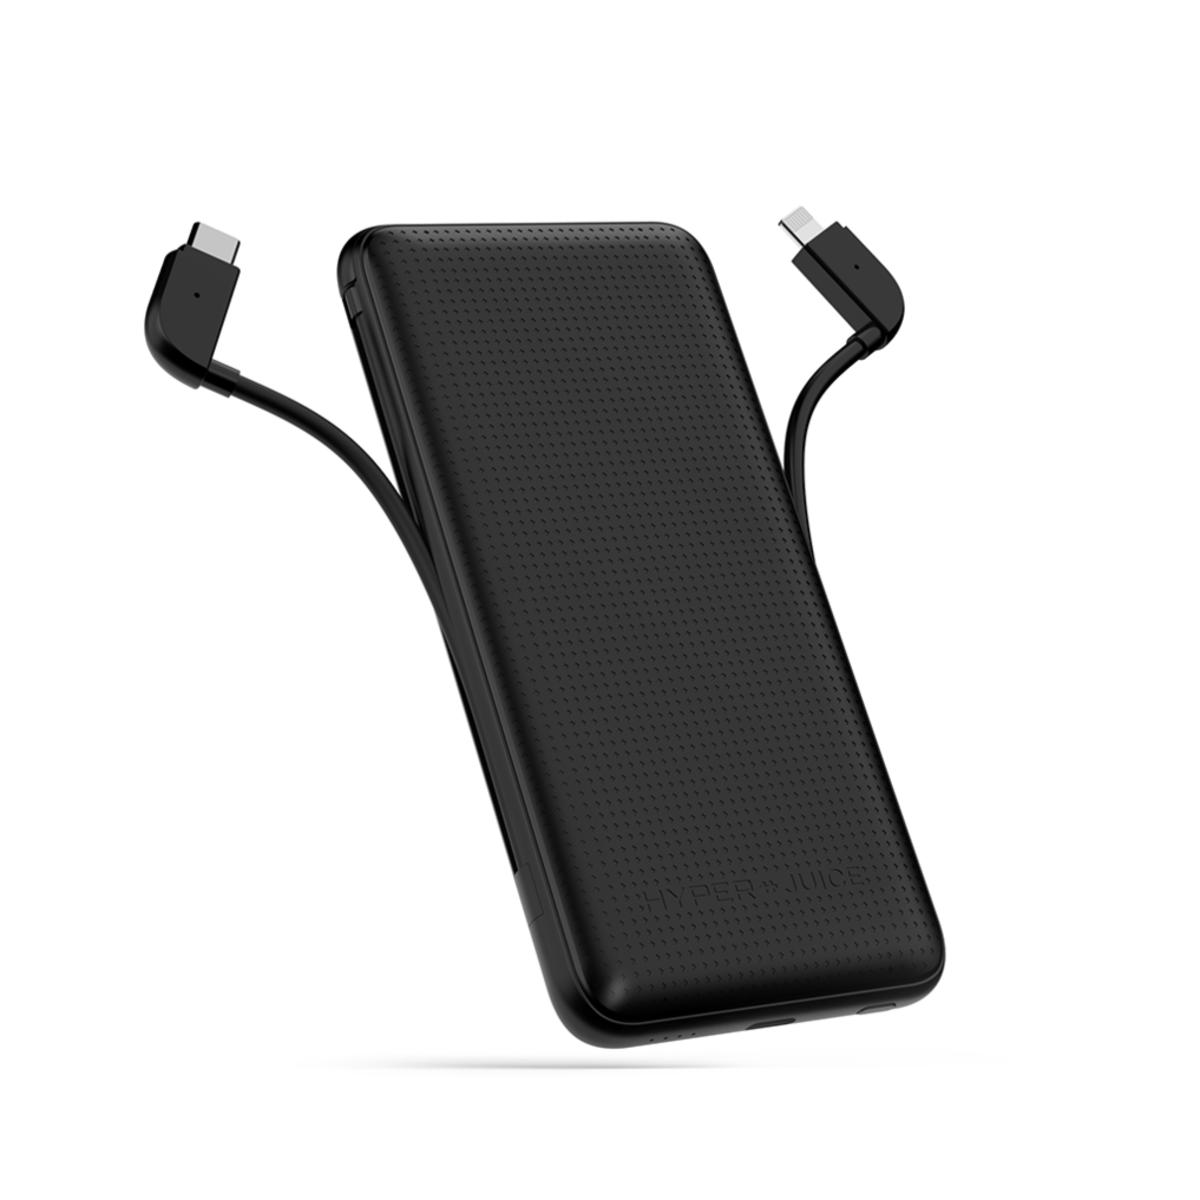 HyperJuice USB-C + Lightning Battery